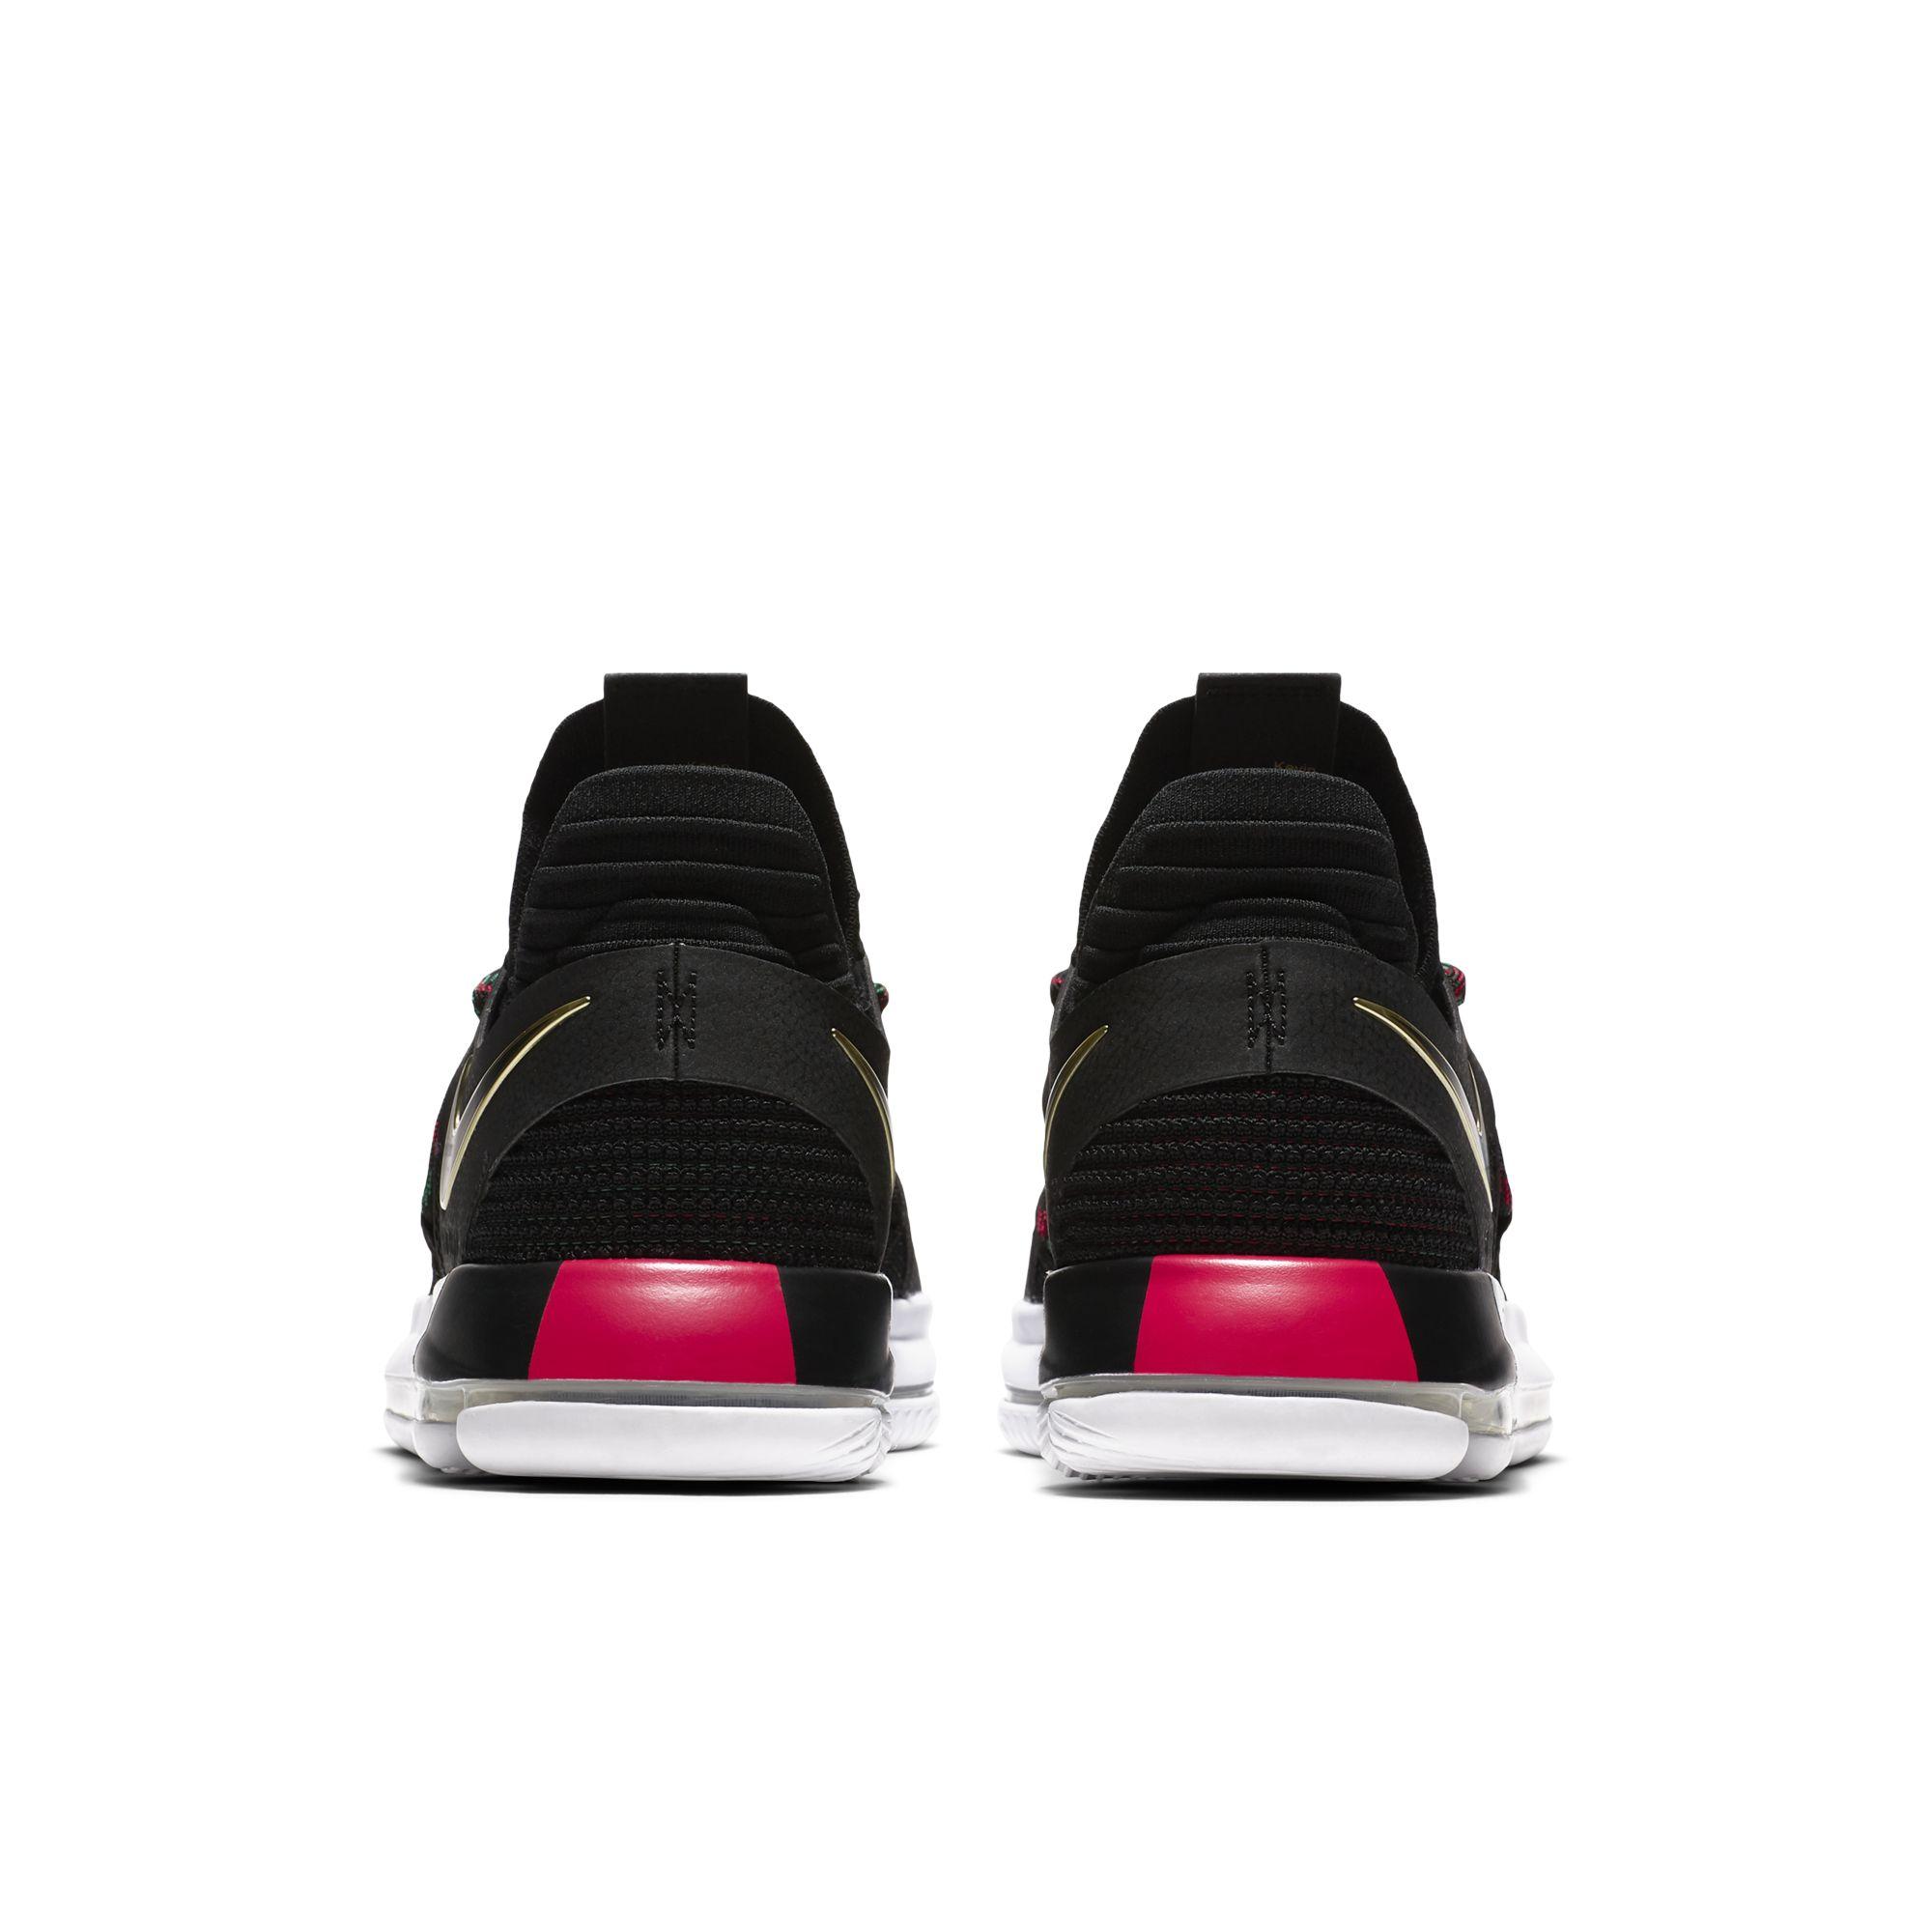 more photos c48a2 5891c Nike-kd-10-bhm-4